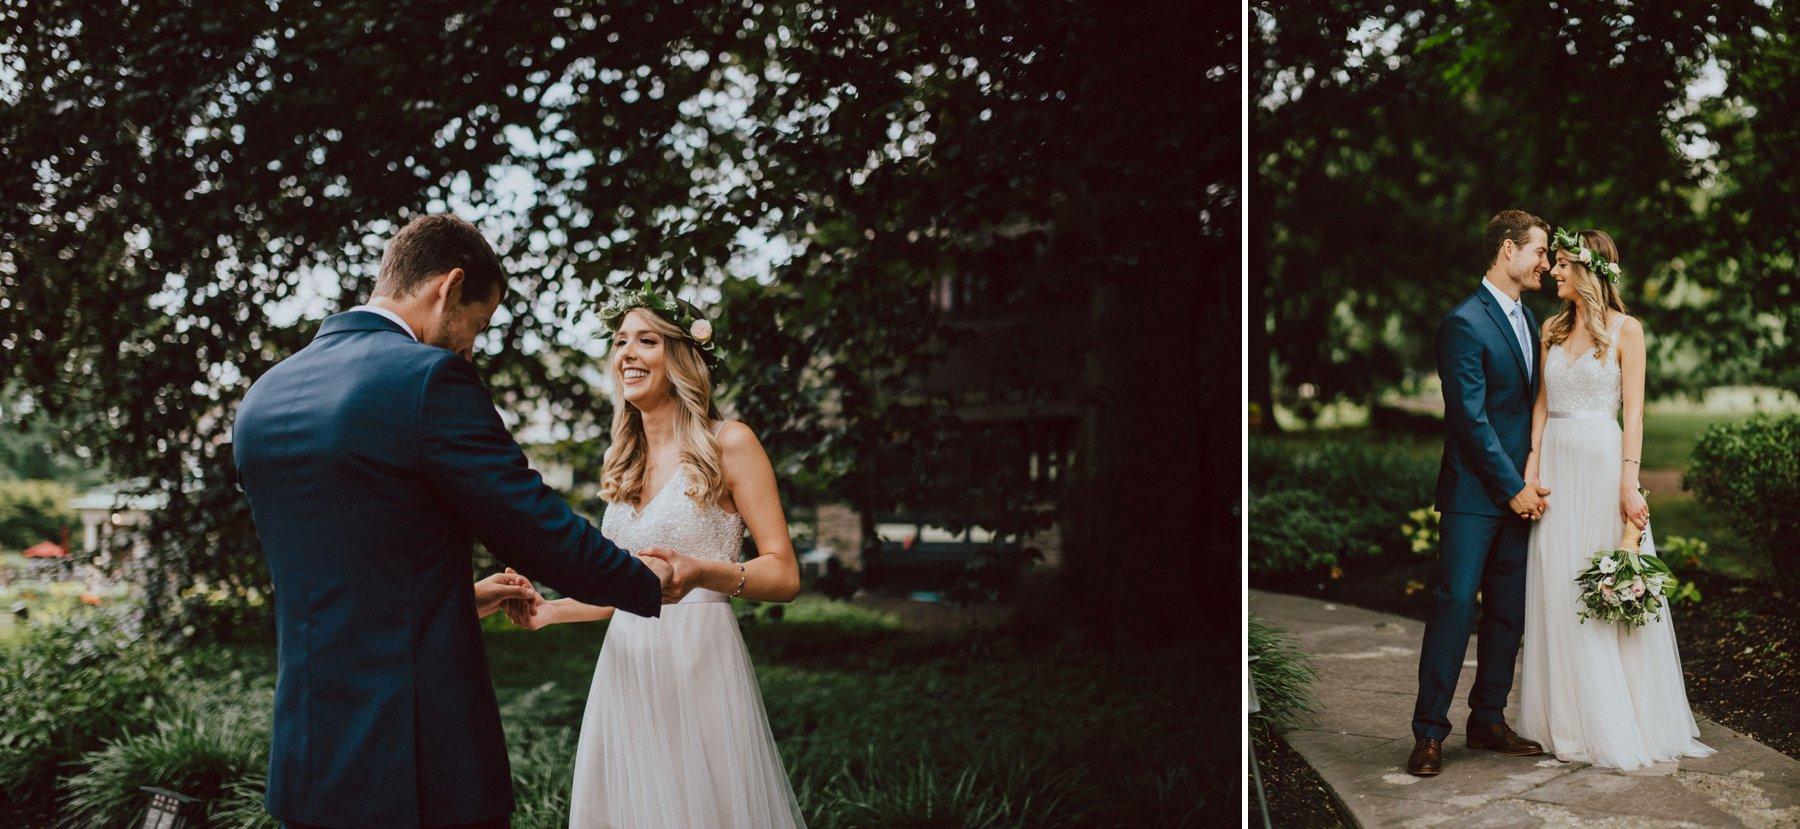 Knowlton-mansion-wedding-52.jpg